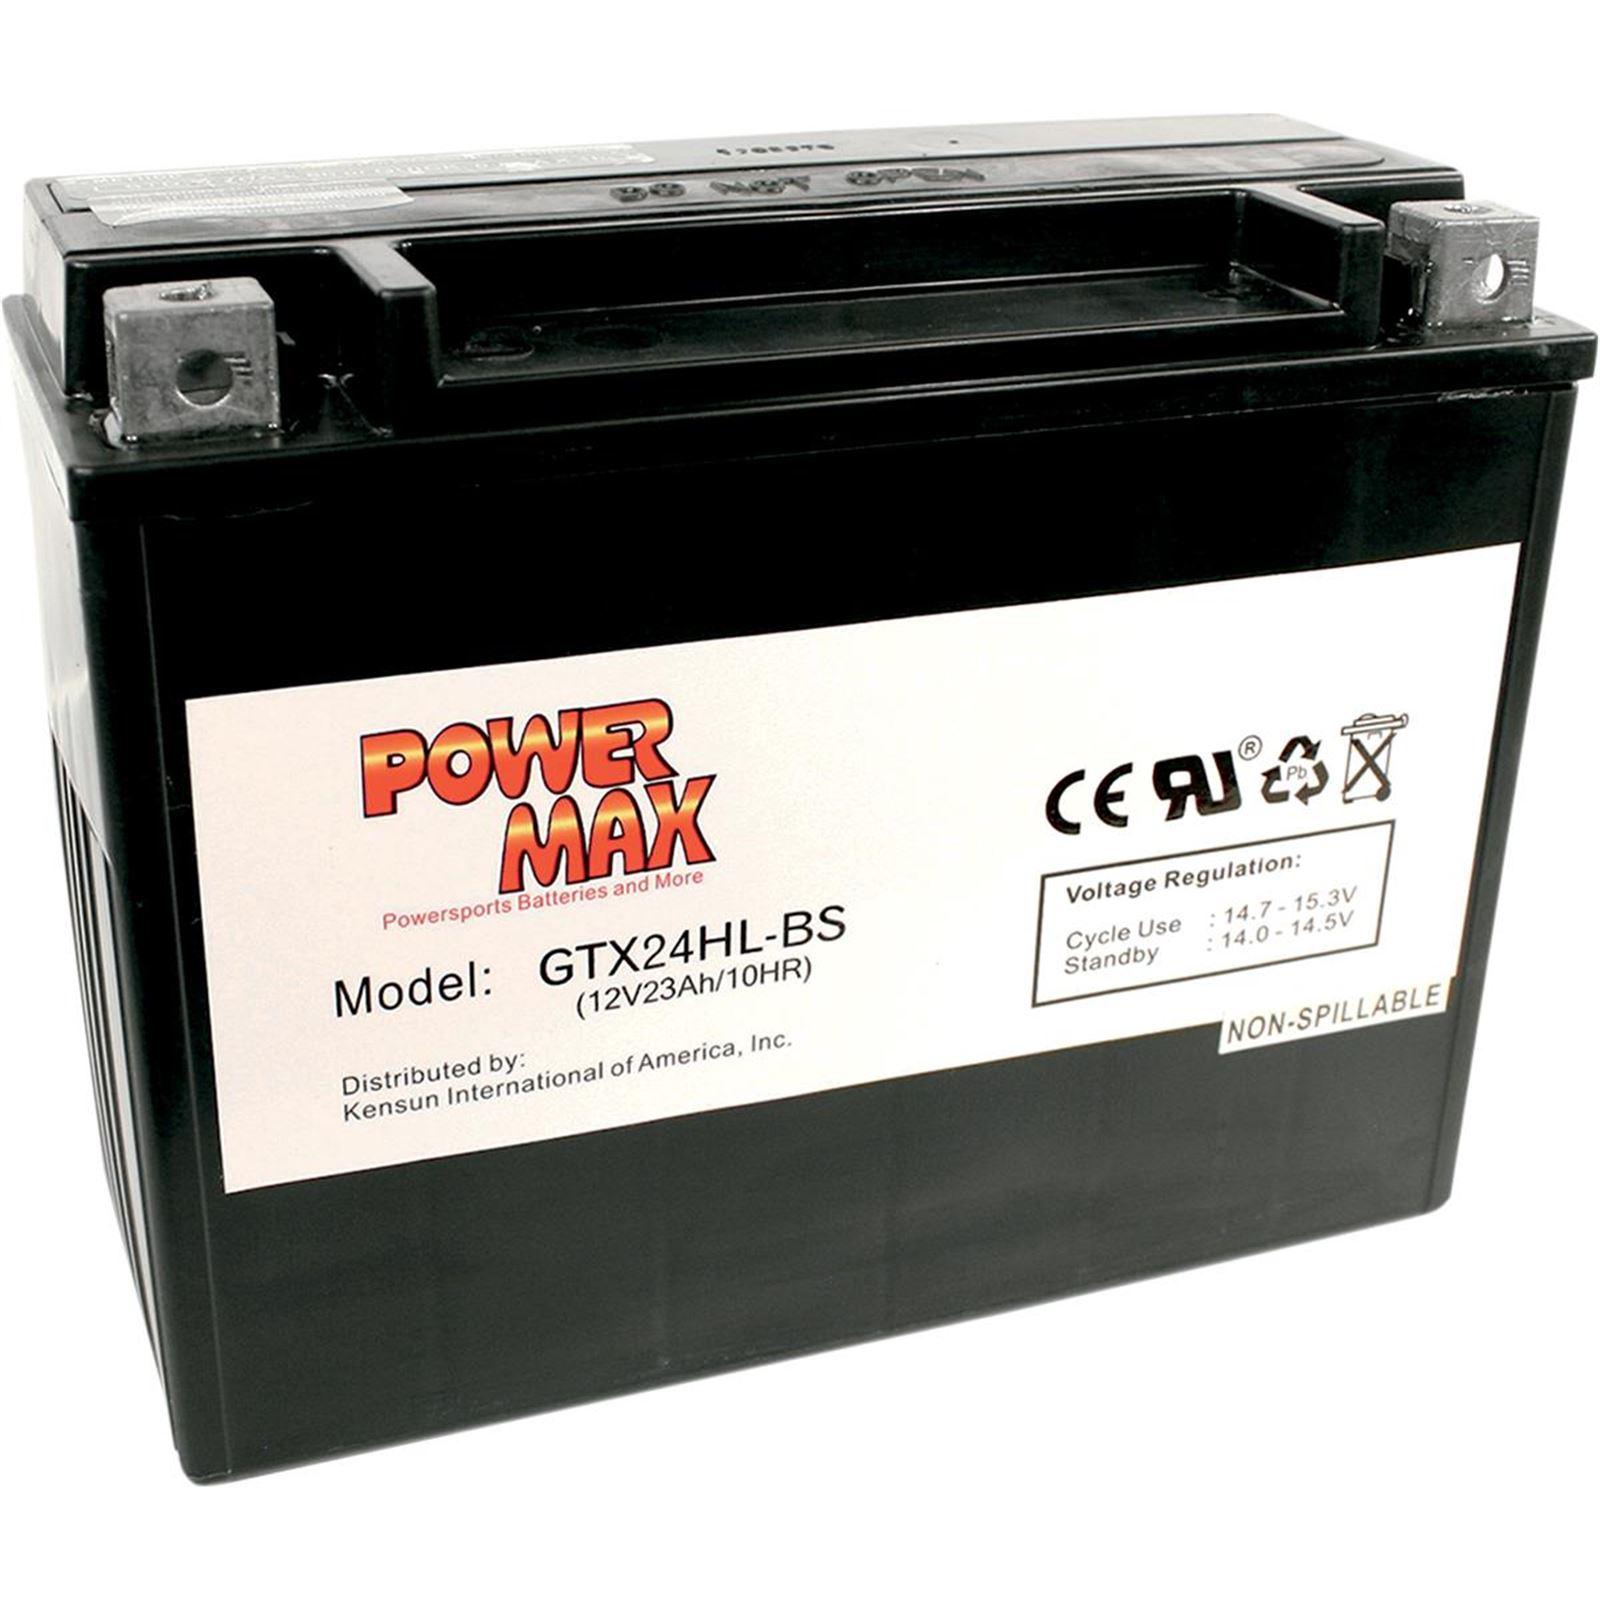 Power Max Battery - GTX24HL-BS